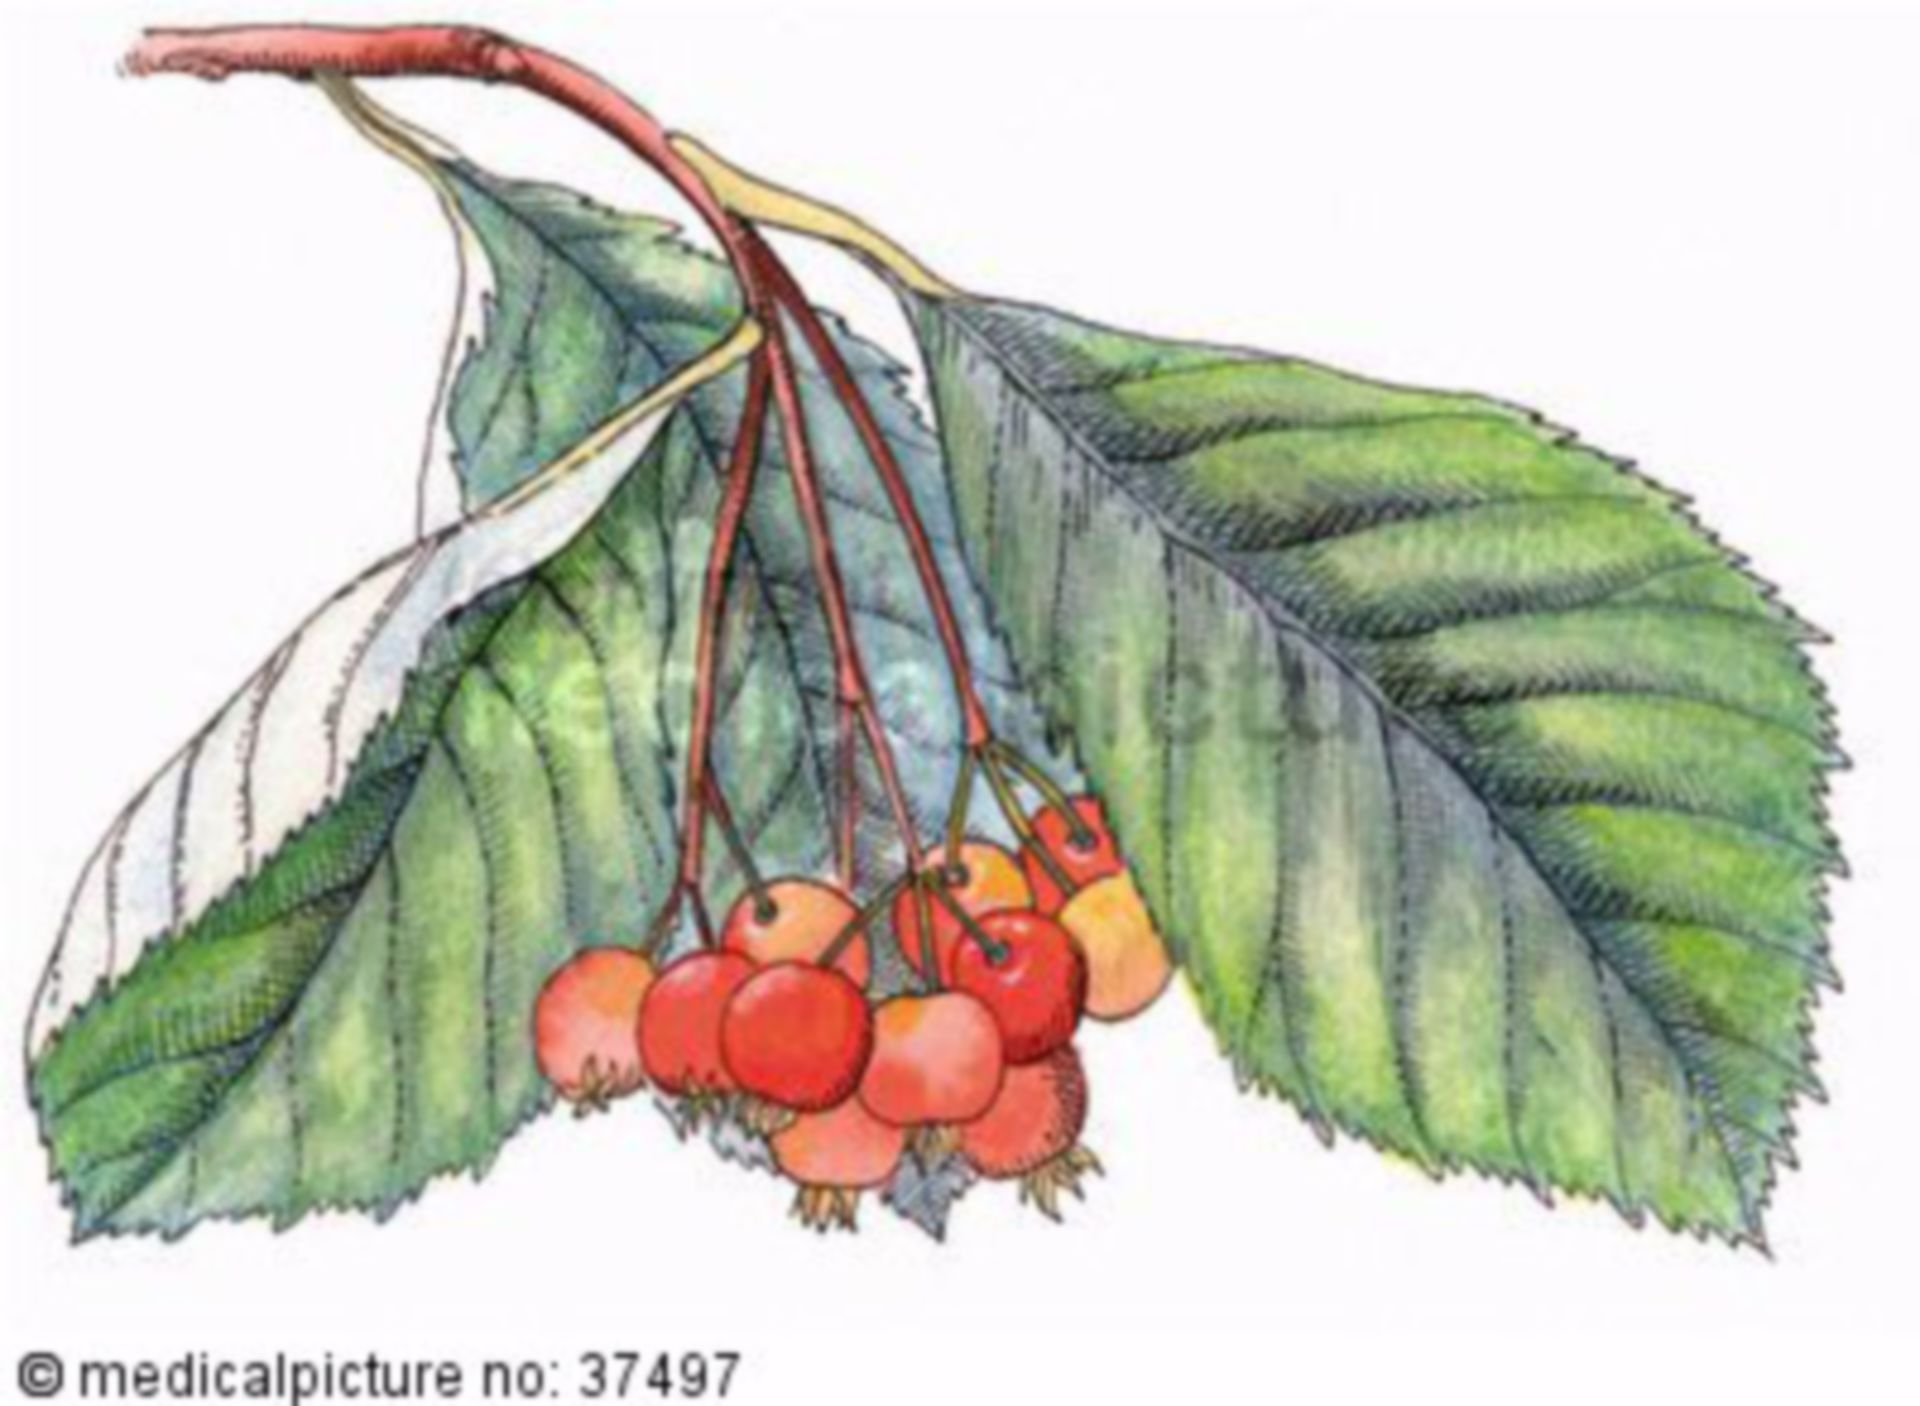 Mehlbeere, Sorbus aria